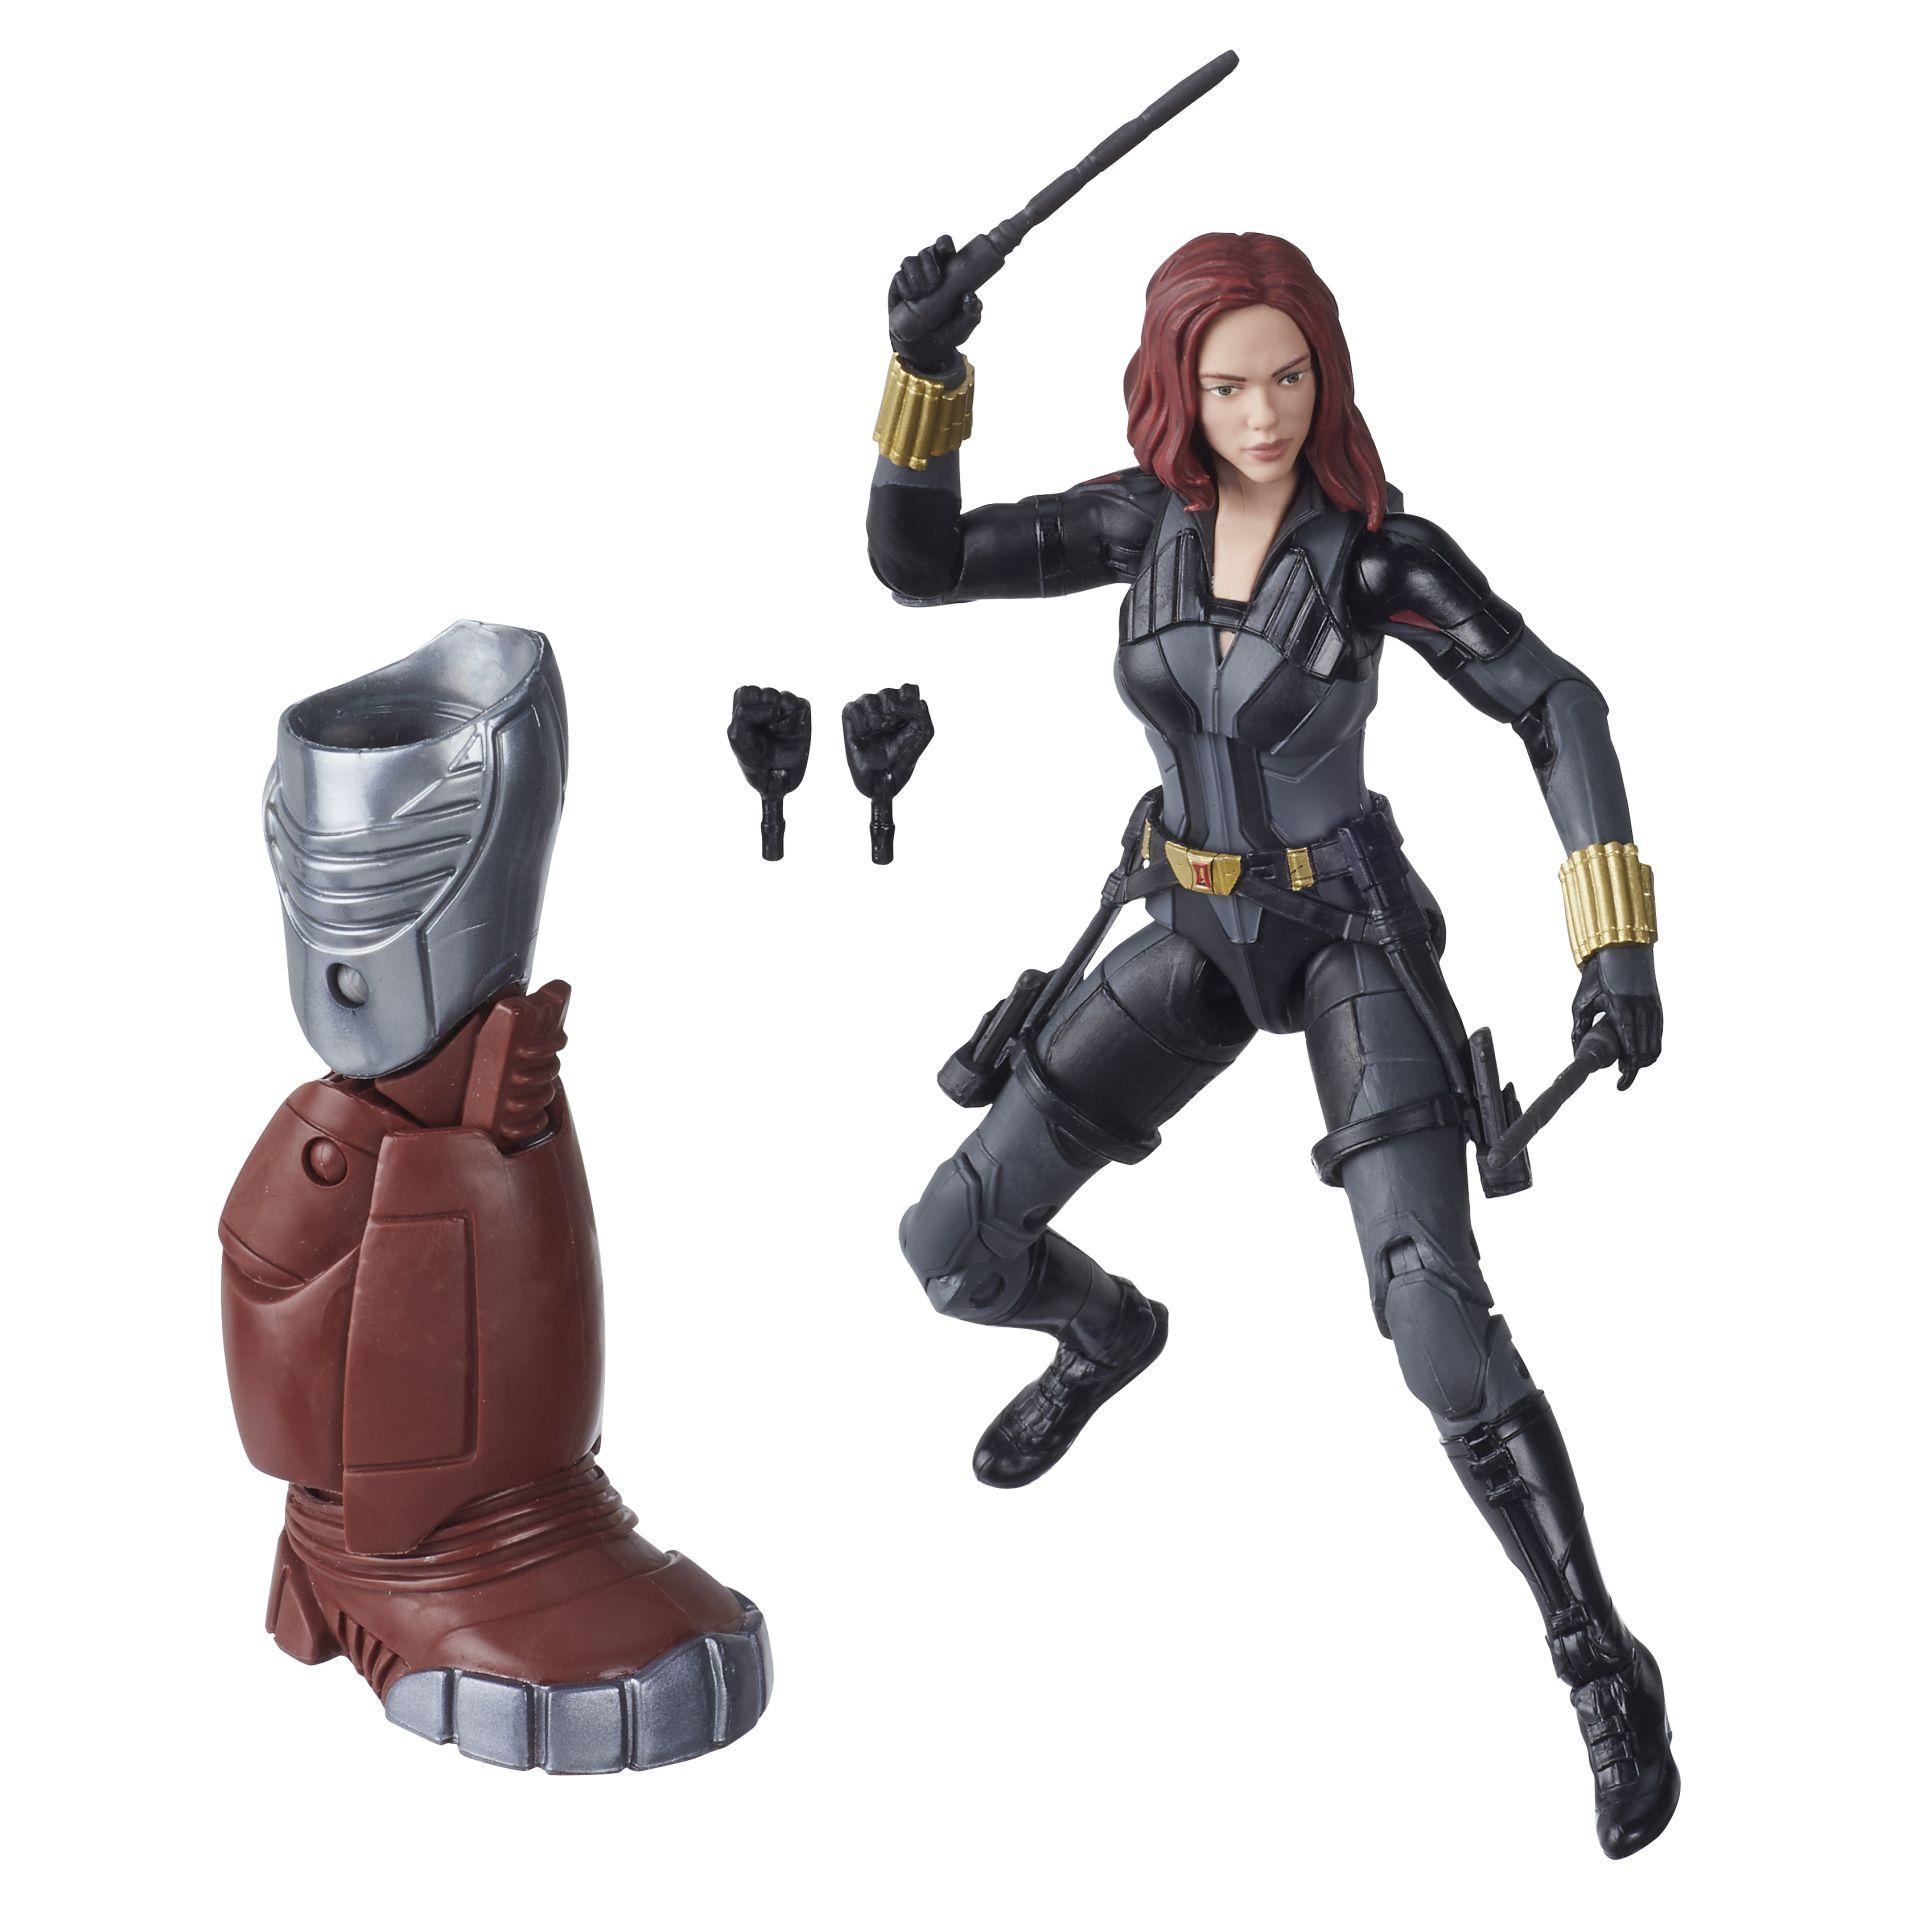 Hasbro Reveals Marvel Legends Black Widow Series for Spring '20